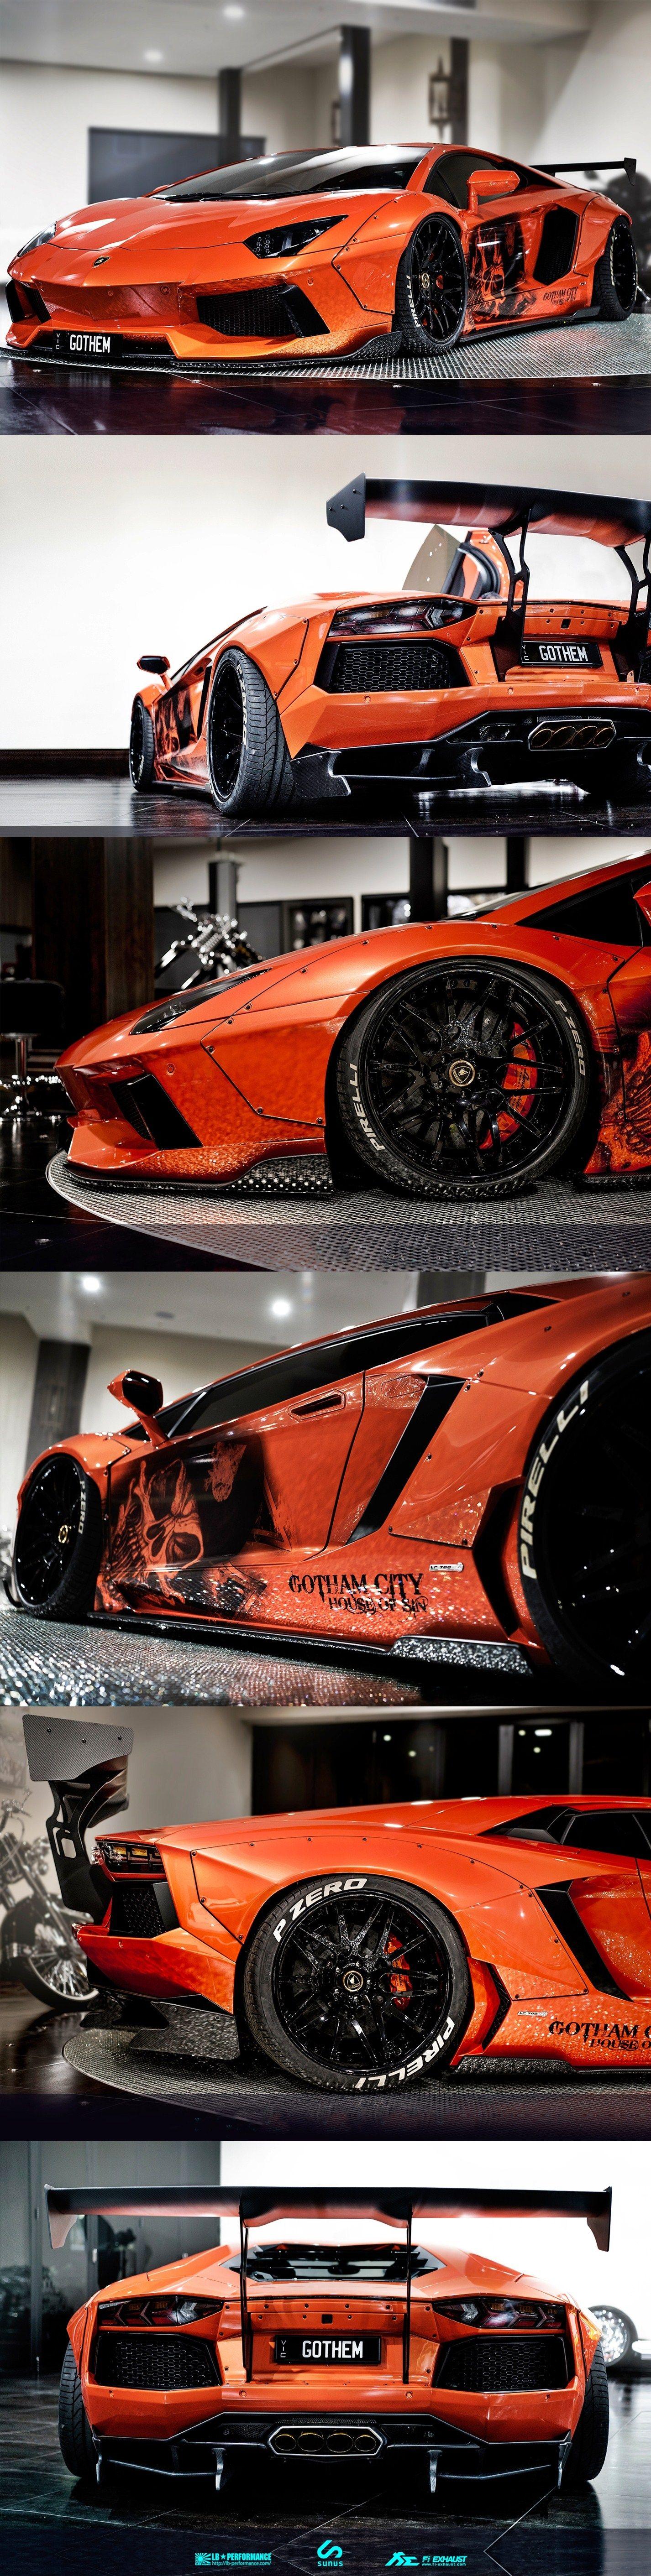 The Incredible Lamborghini Aventador Lamborghini Aventador